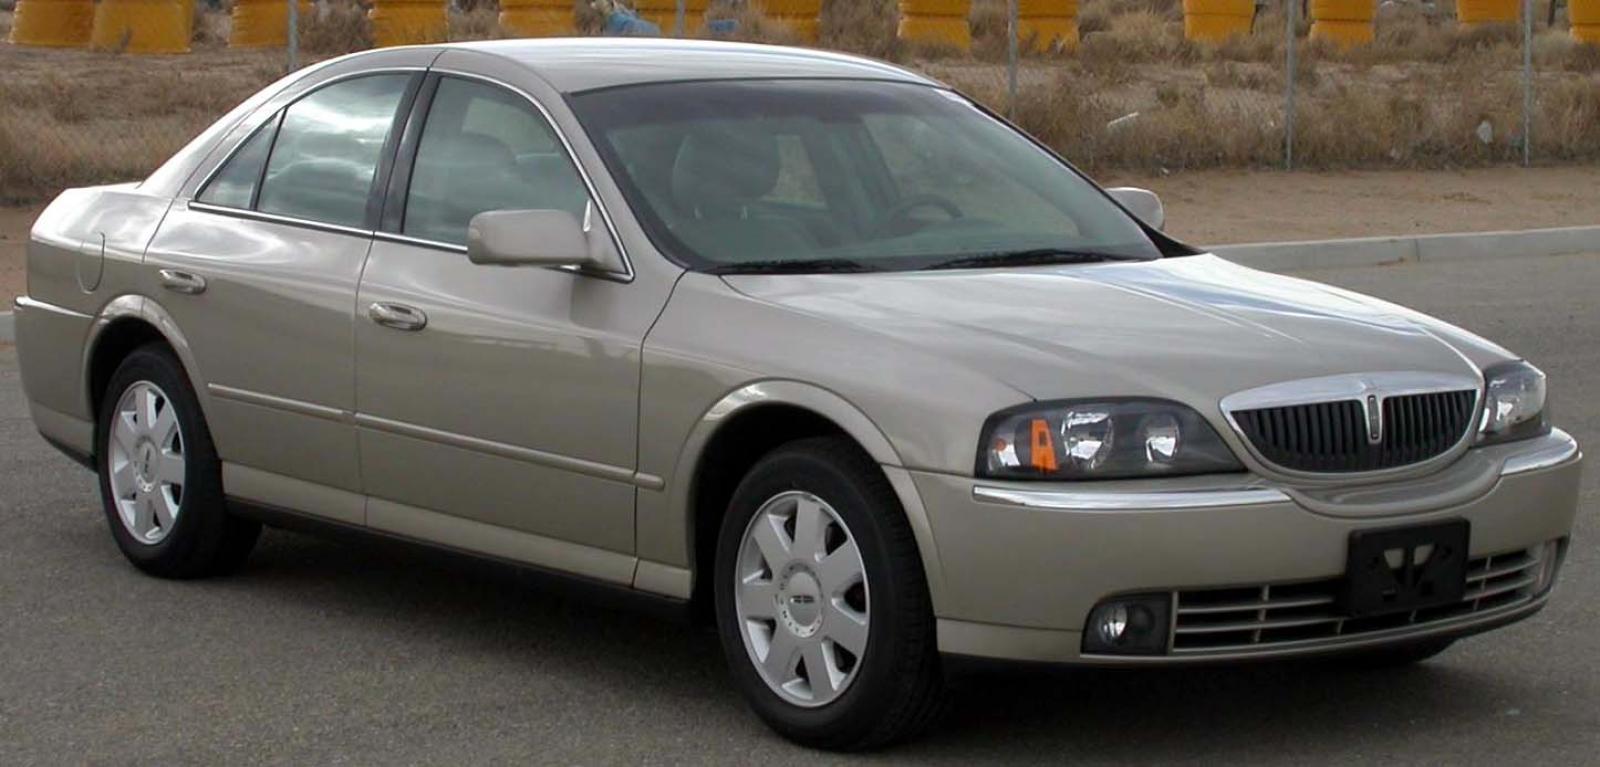 438884 2004 Lincoln Mkz